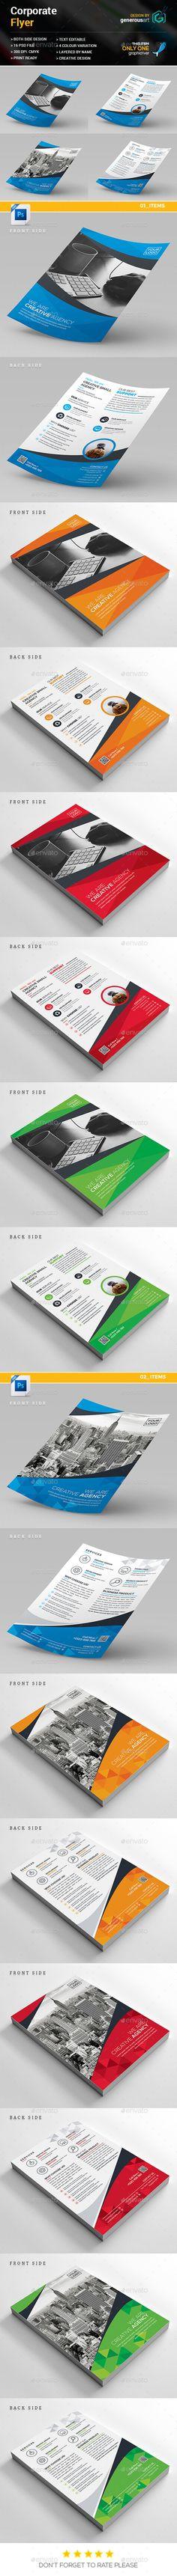 Flyer Template PSD Bundle. Download here: https://graphicriver.net/item/flyer-bundle-2-in-1/17557989?ref=ksioks